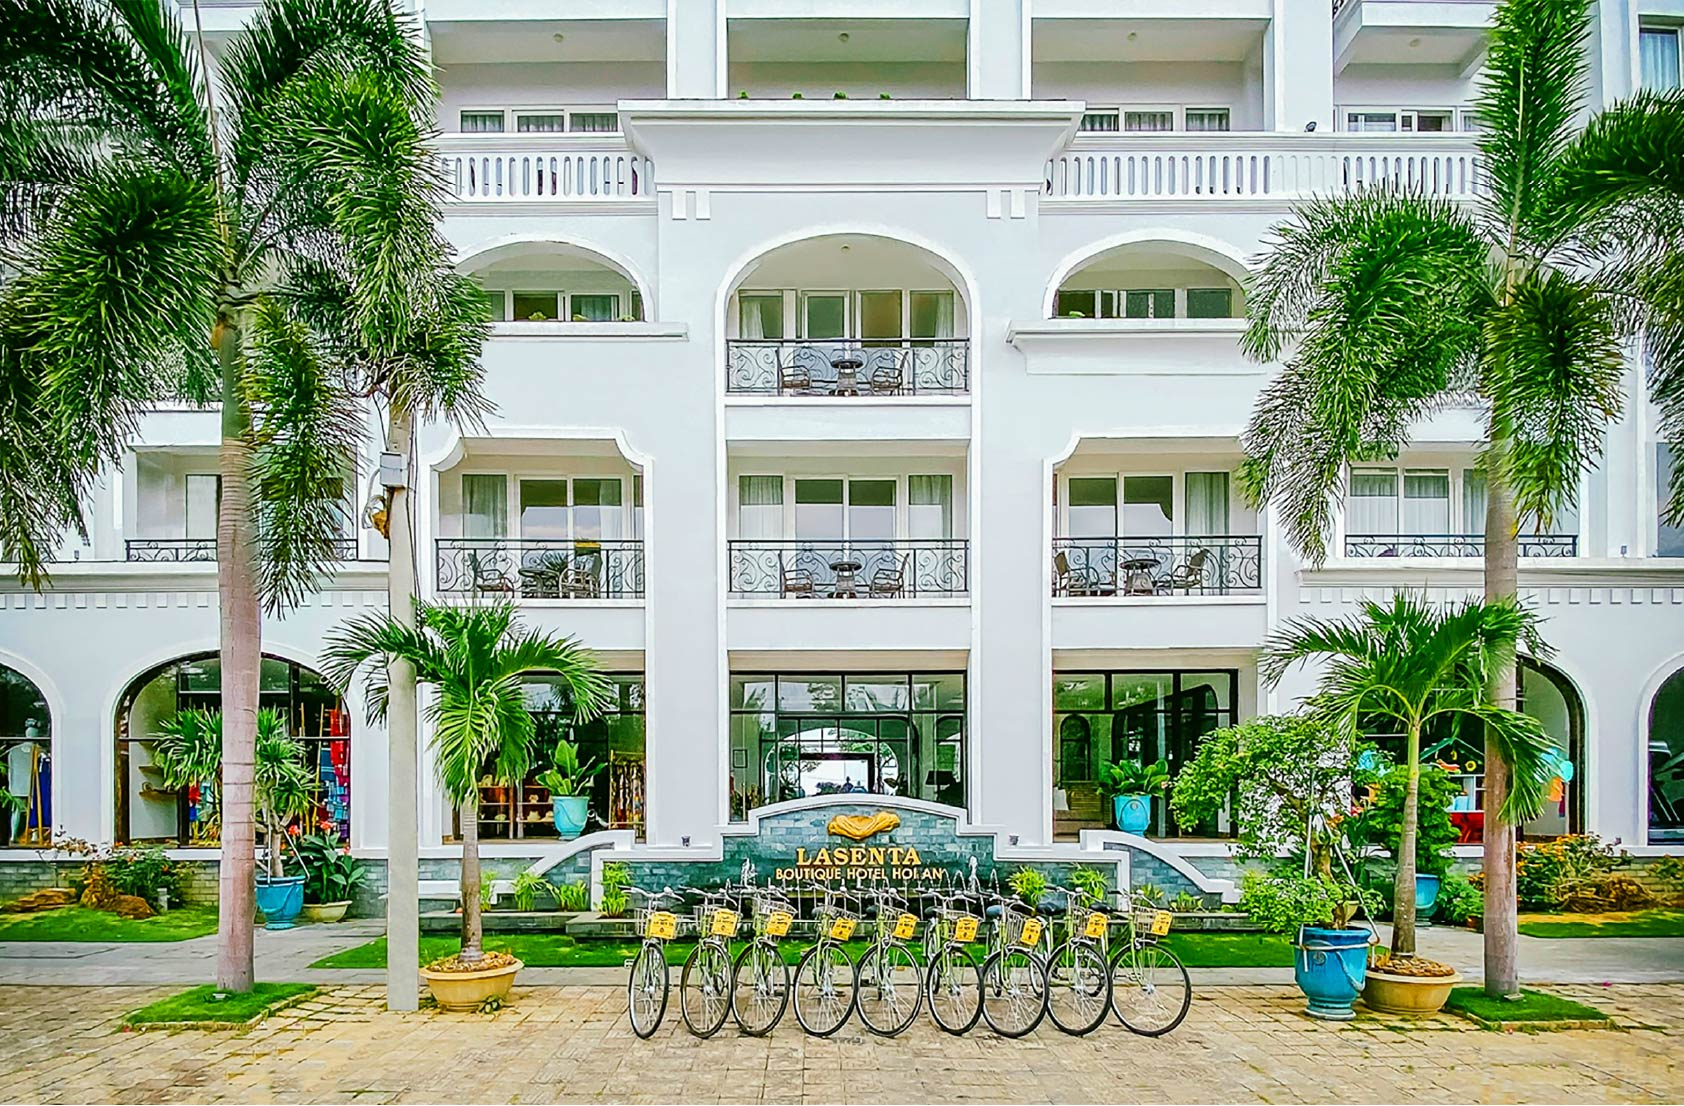 Lasenta Boutique Hotel – khách sạn đẹp ở Hội An